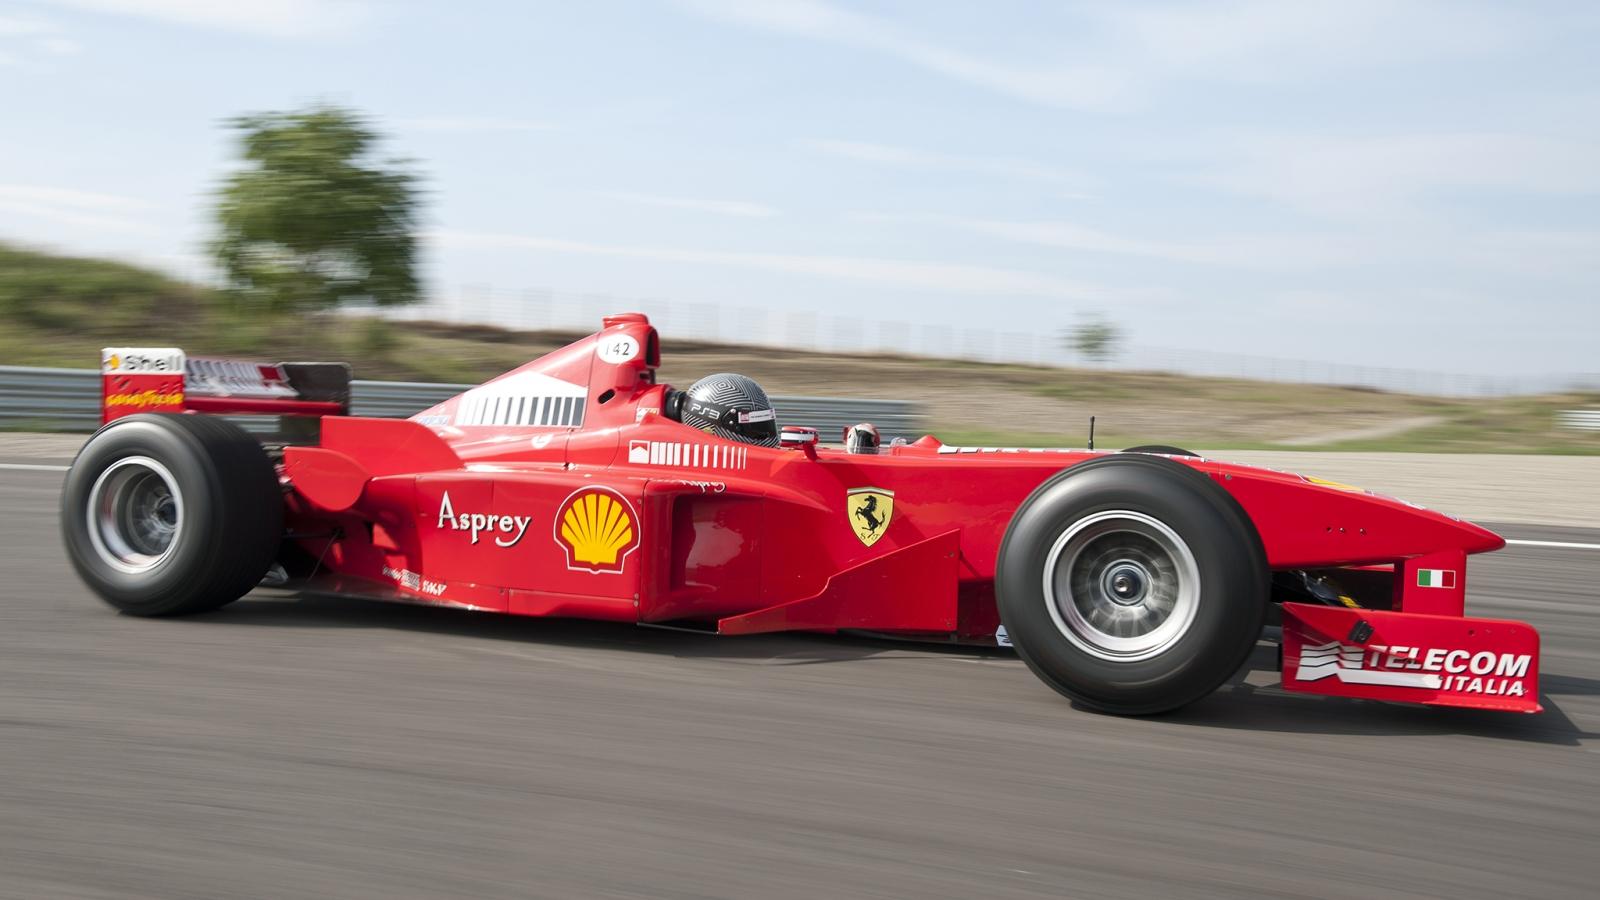 Ferrari F300 Formula 1 - 1600x900